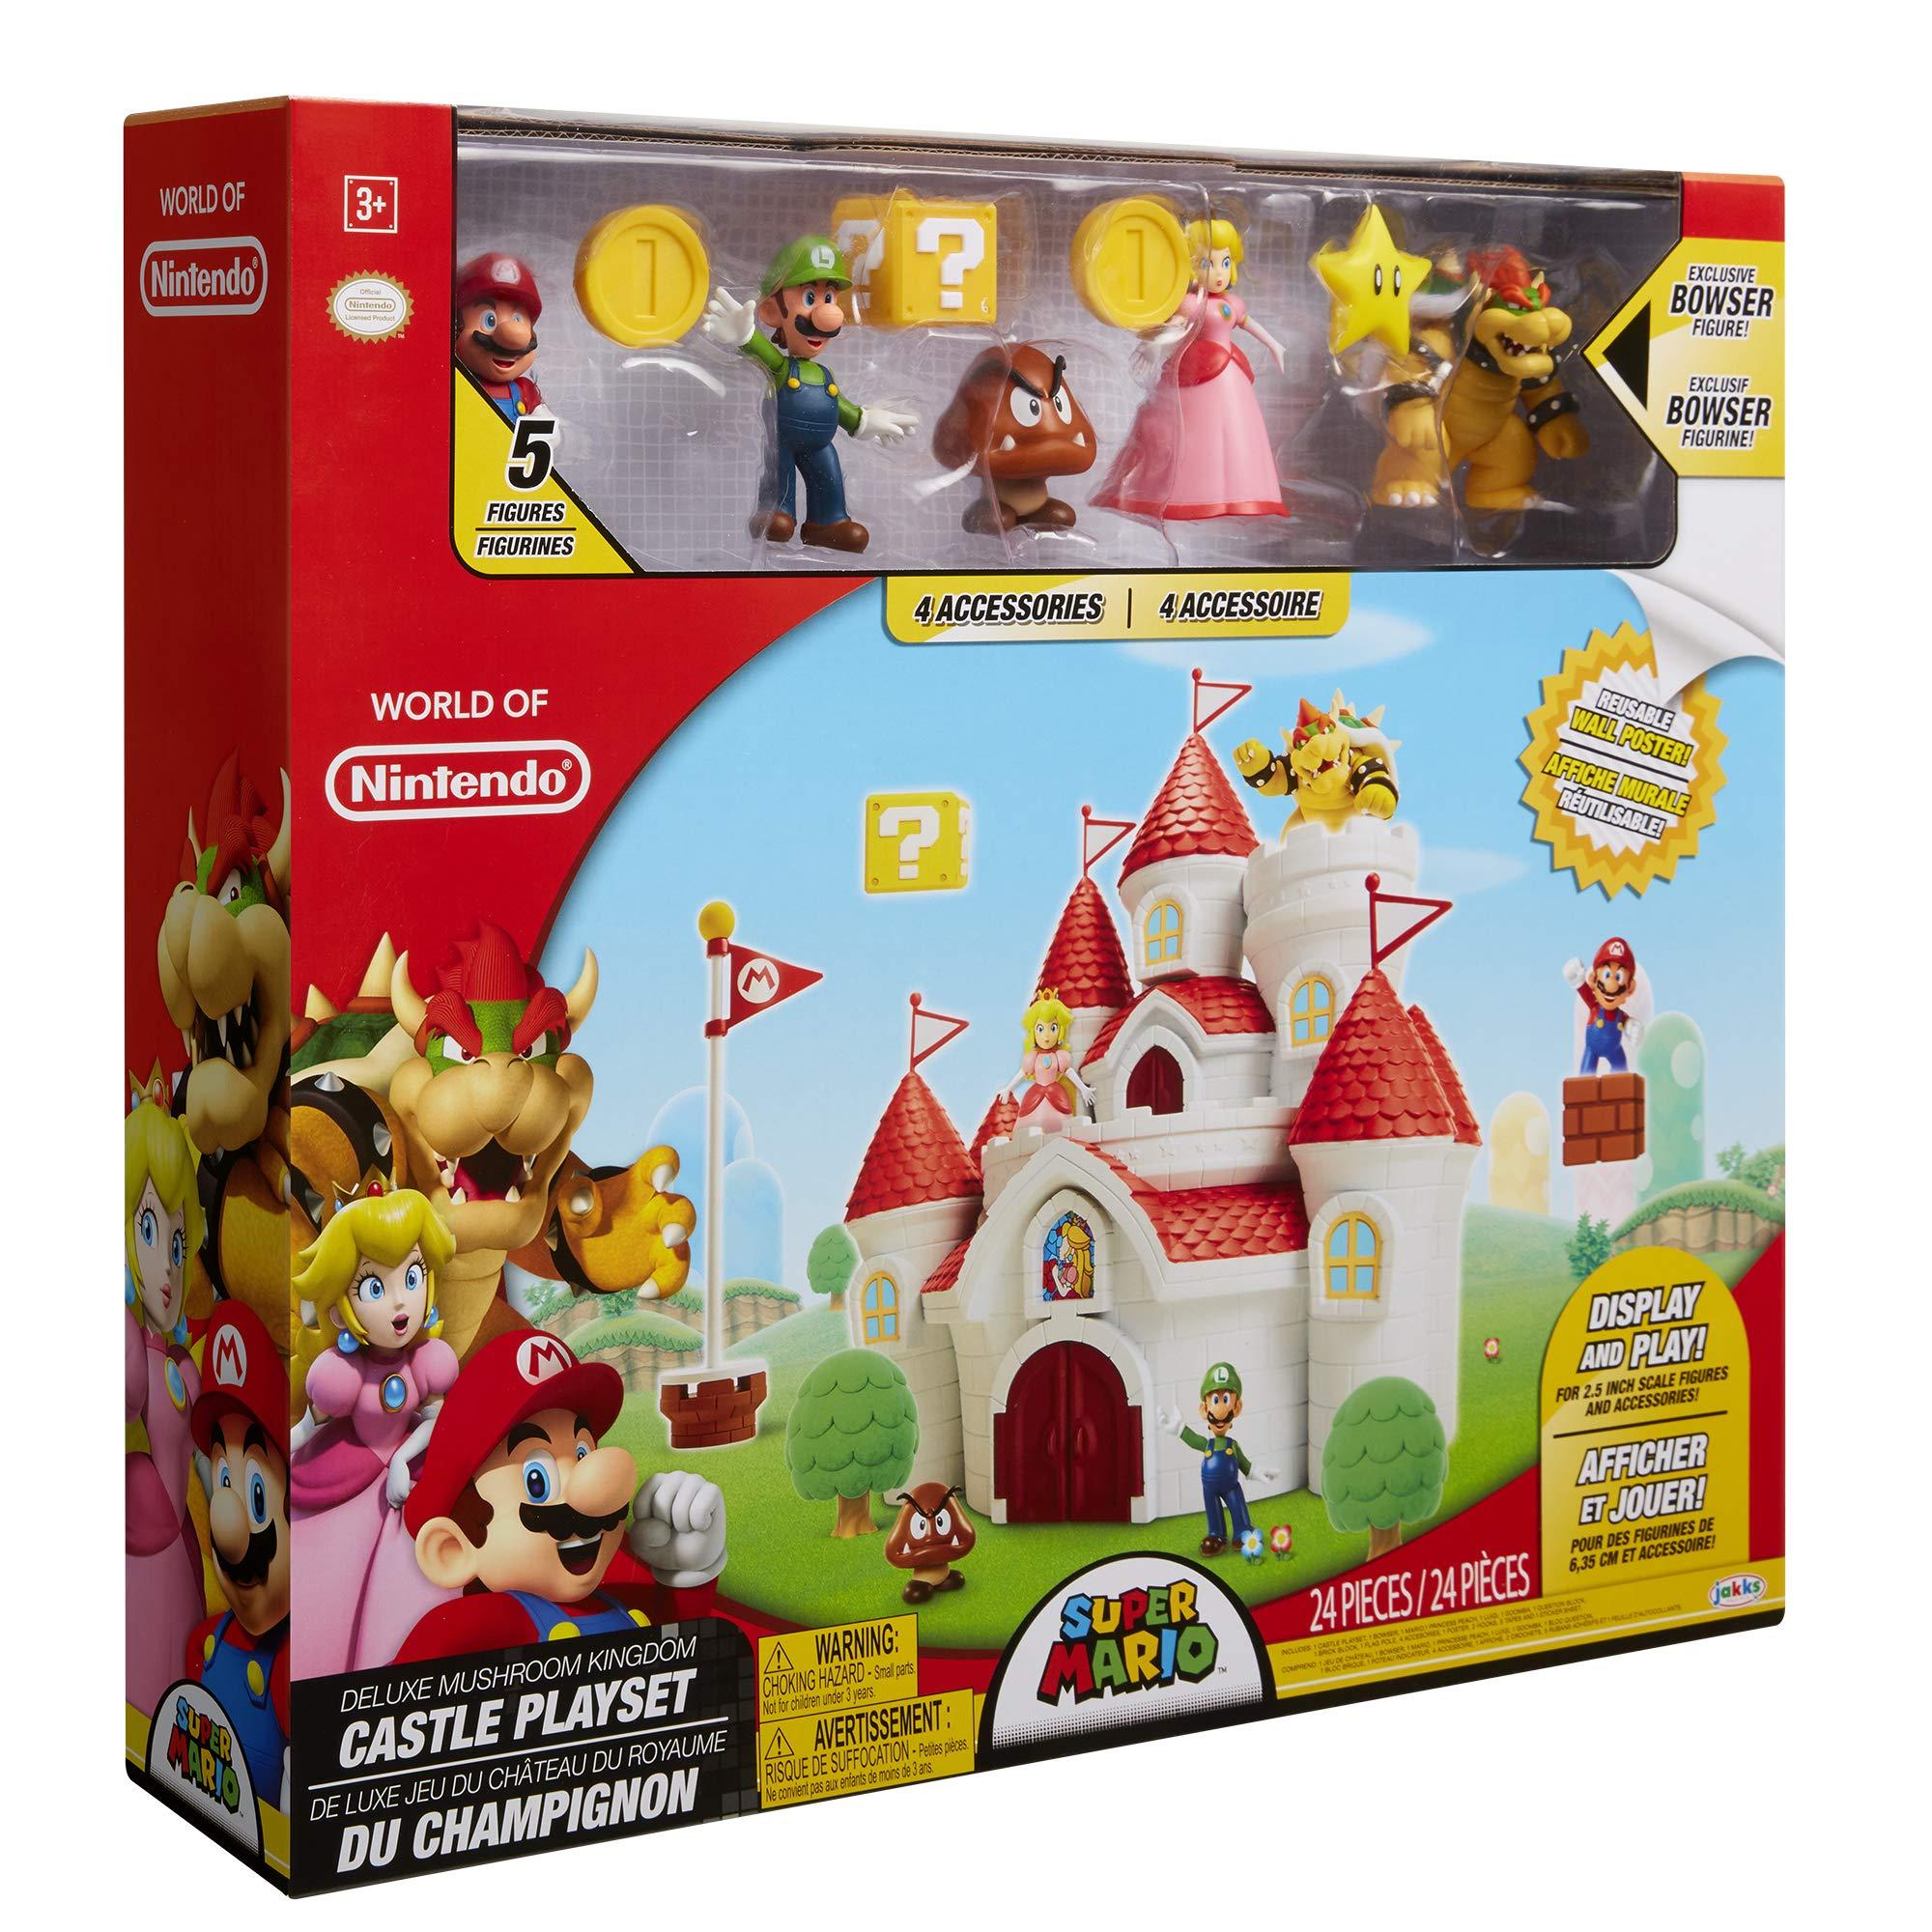 Nintendo Super Mario Deluxe Mushroom Kingdom Castle Playset with 5 Figures & 4 Accessories by Nintendo (Image #8)